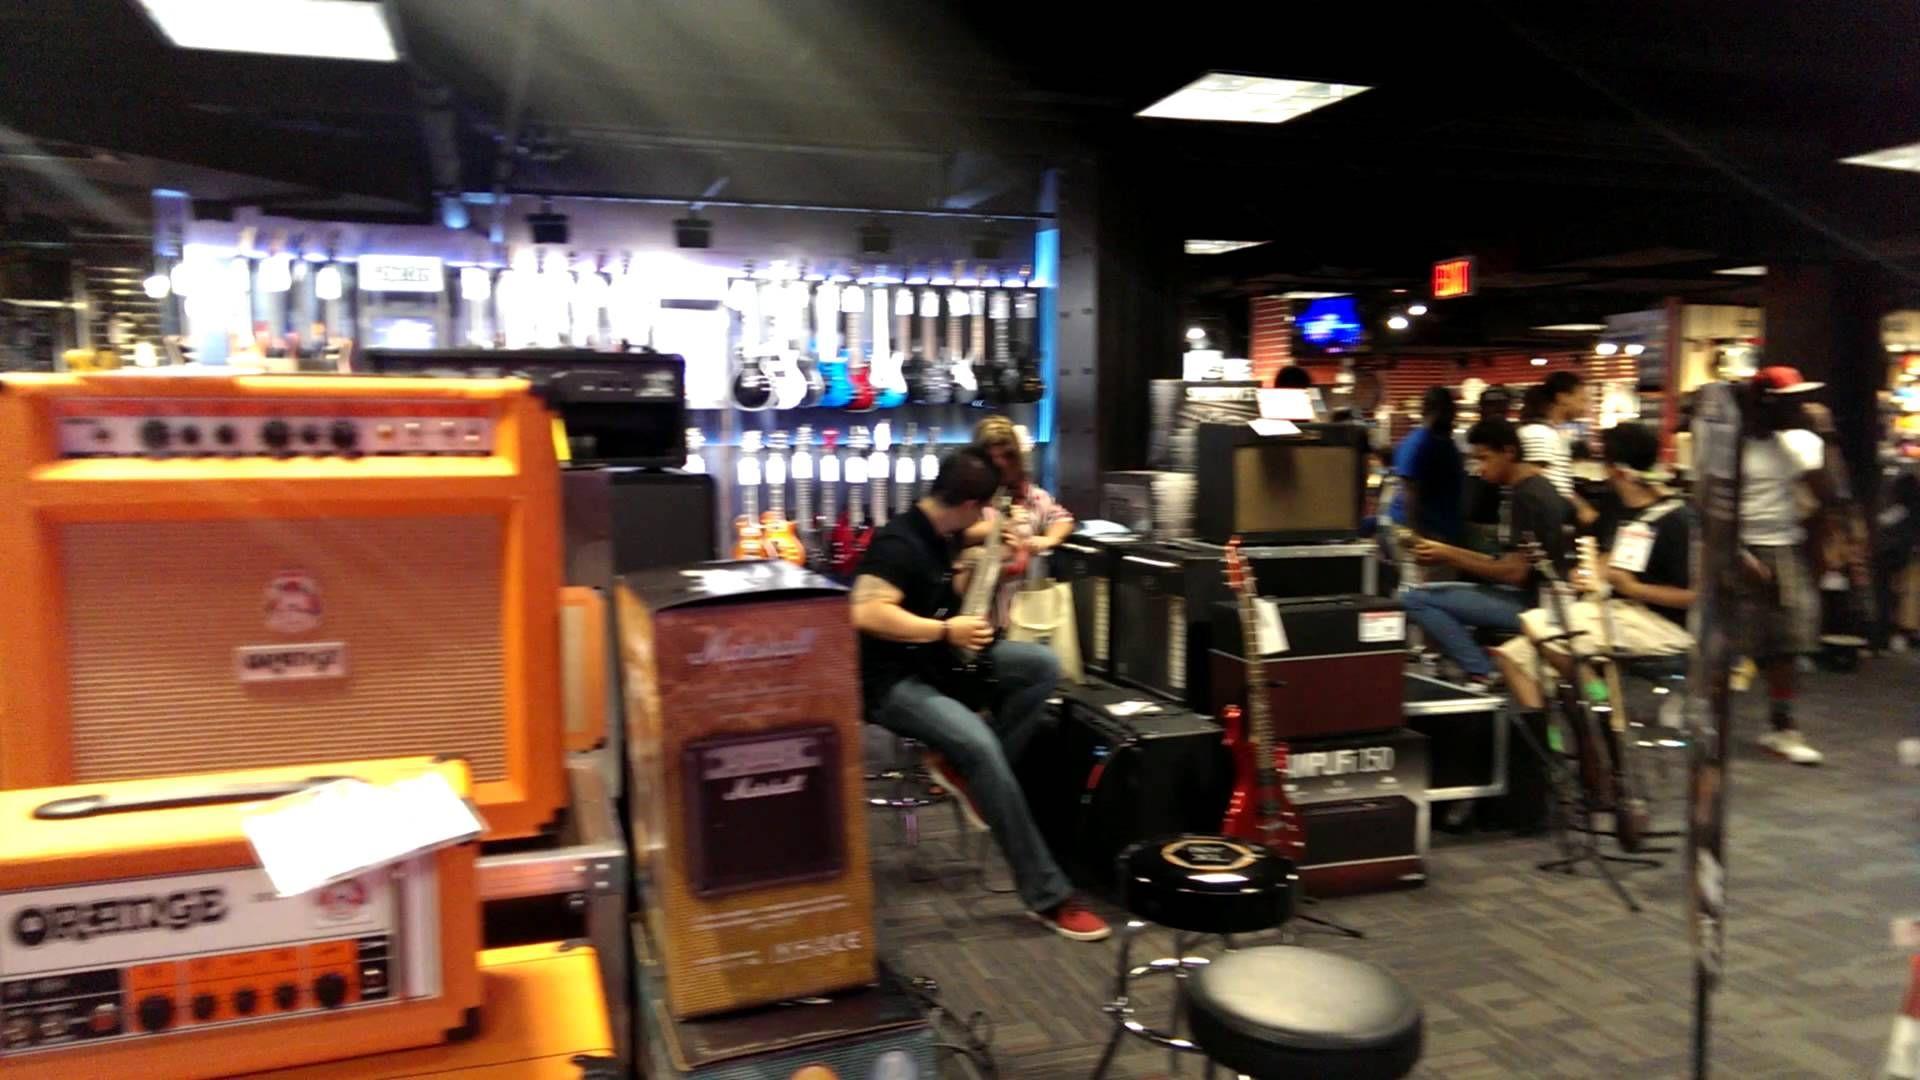 Guitar center videos